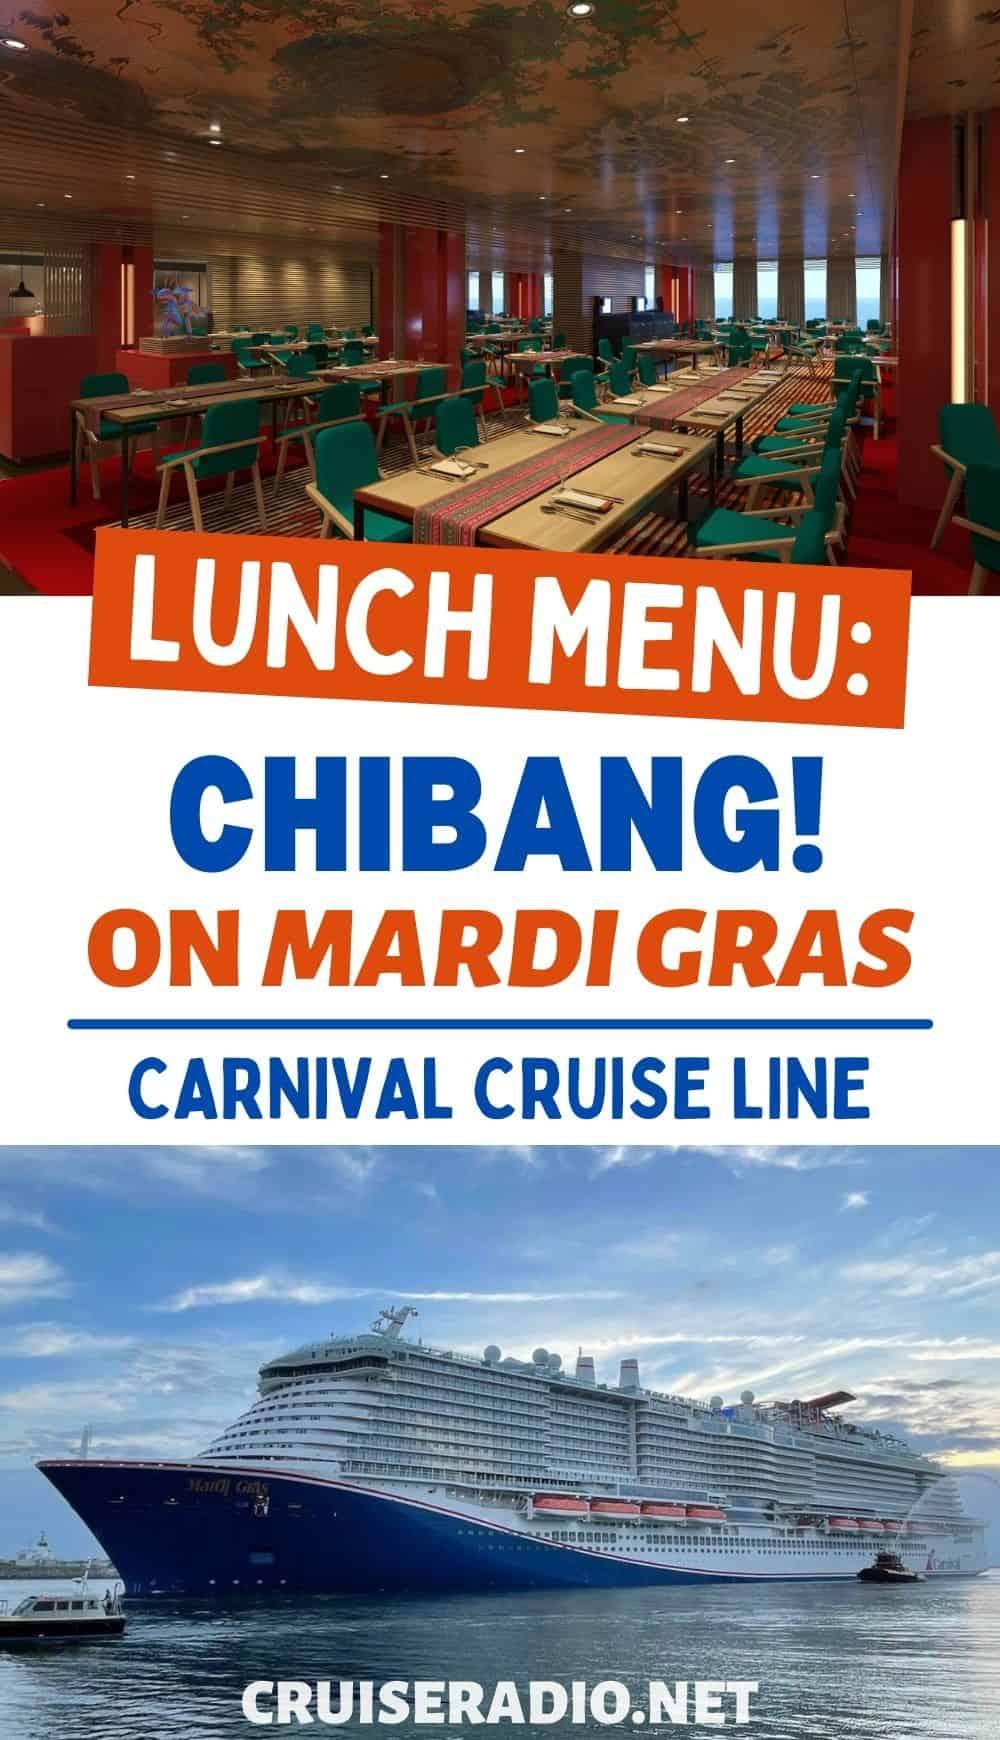 chibang lunch menu carnival cruise